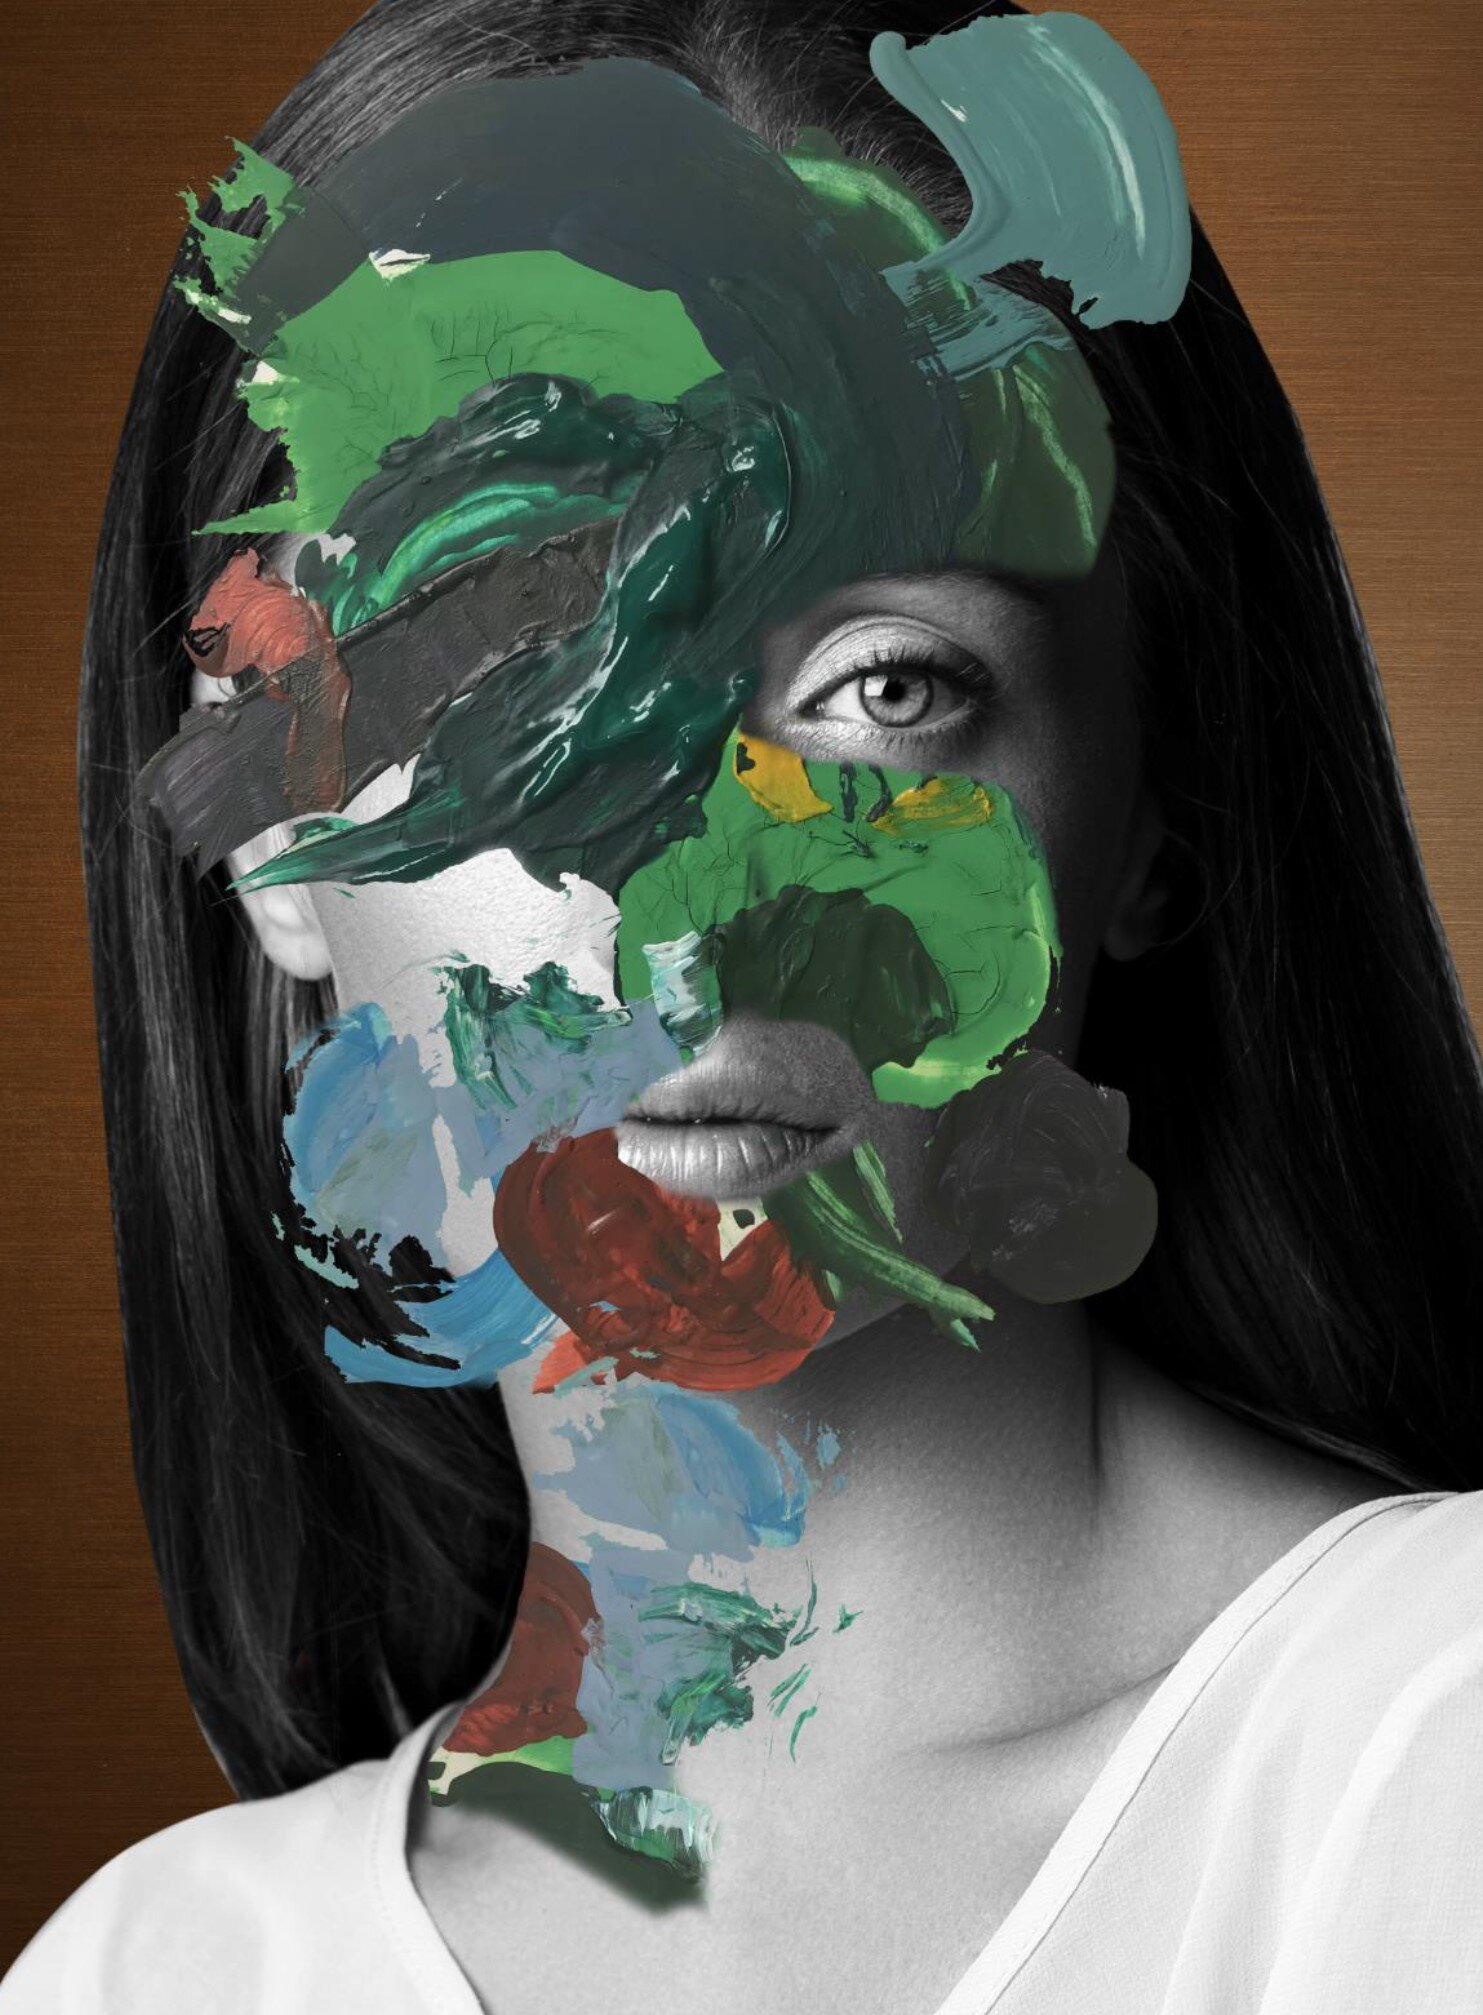 1 - Elegant Clutter, Paint Strokes, (2019)